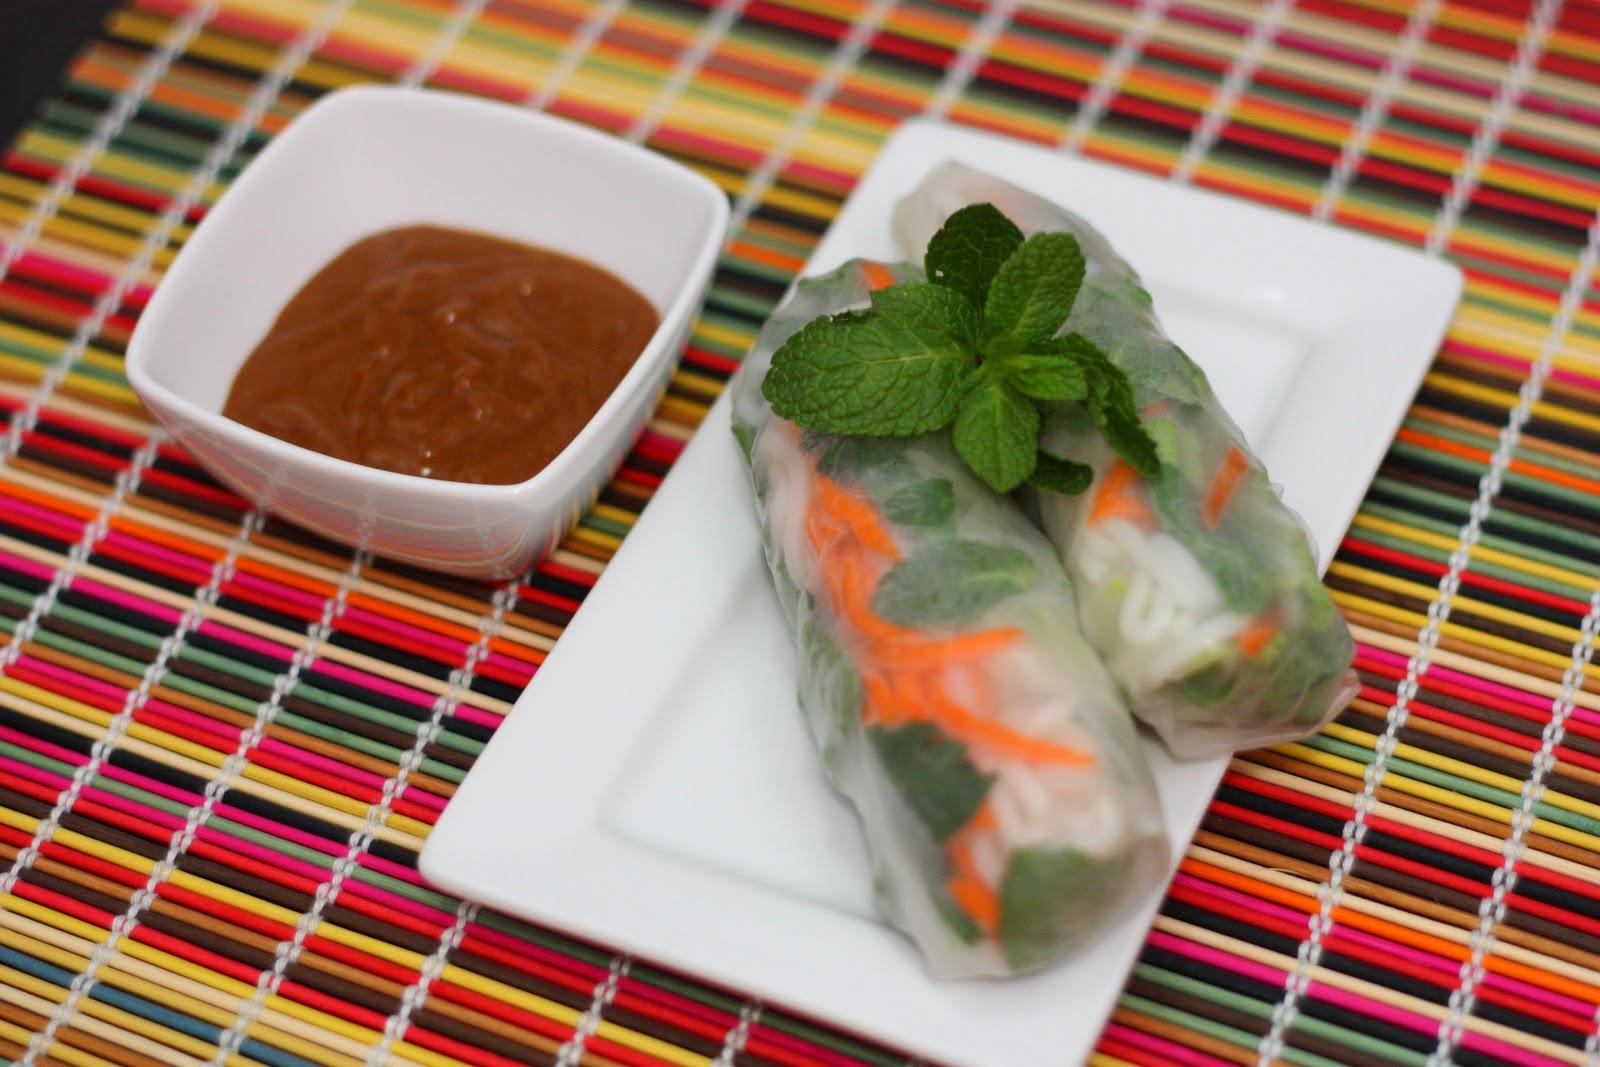 Vietnamese Fresh Spring Rolls with Peanut Sauce (Goi Cuon voi Tuong Dau Phong) - The Viet Vegan